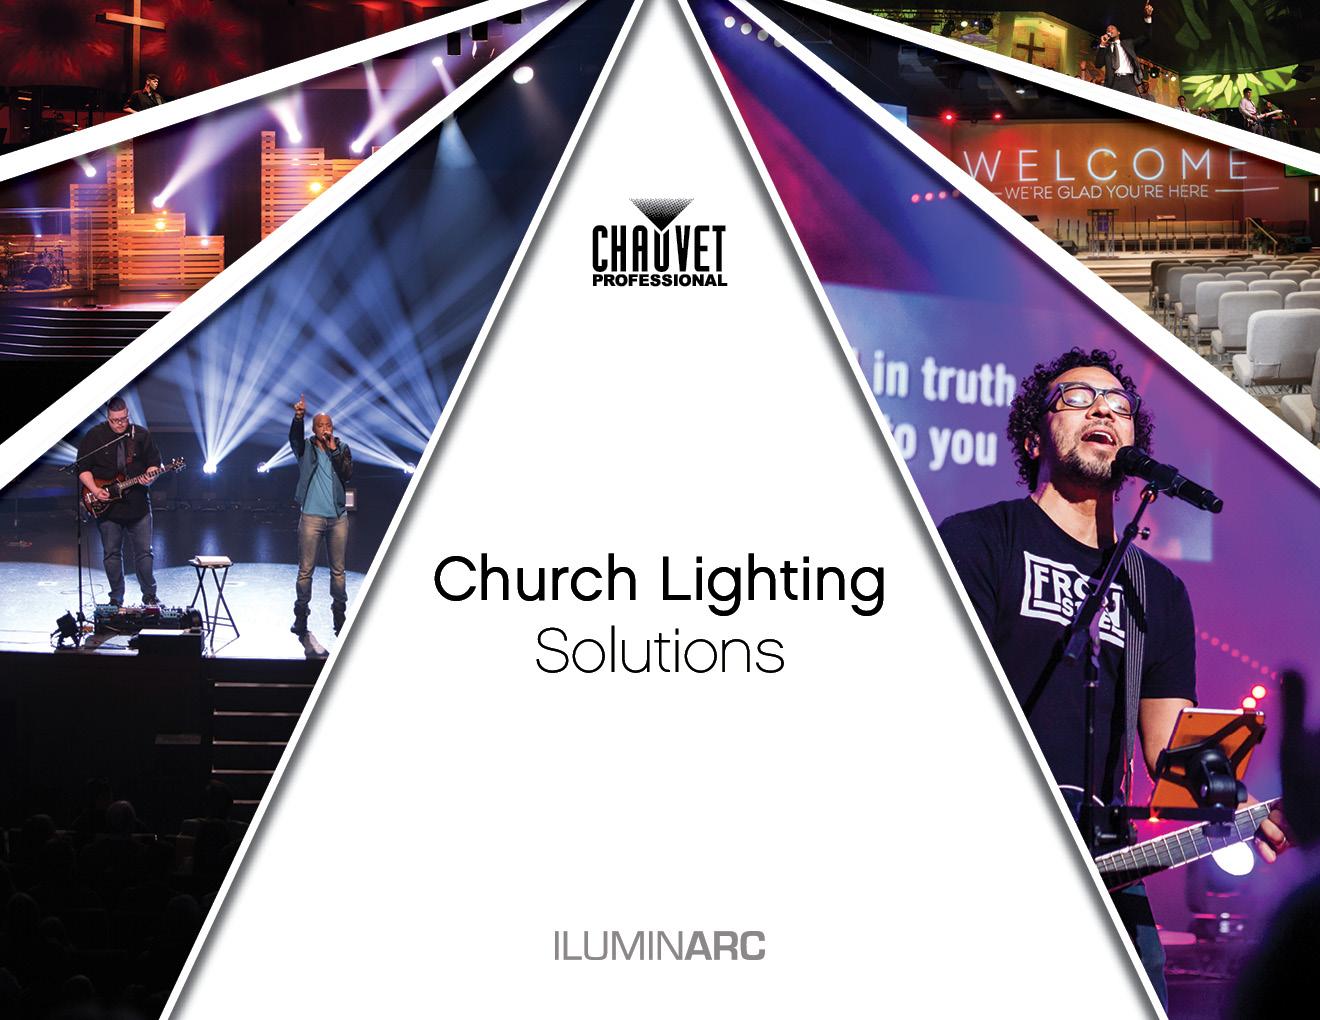 Chauvet Professional Church Lighting Solutions Brochure